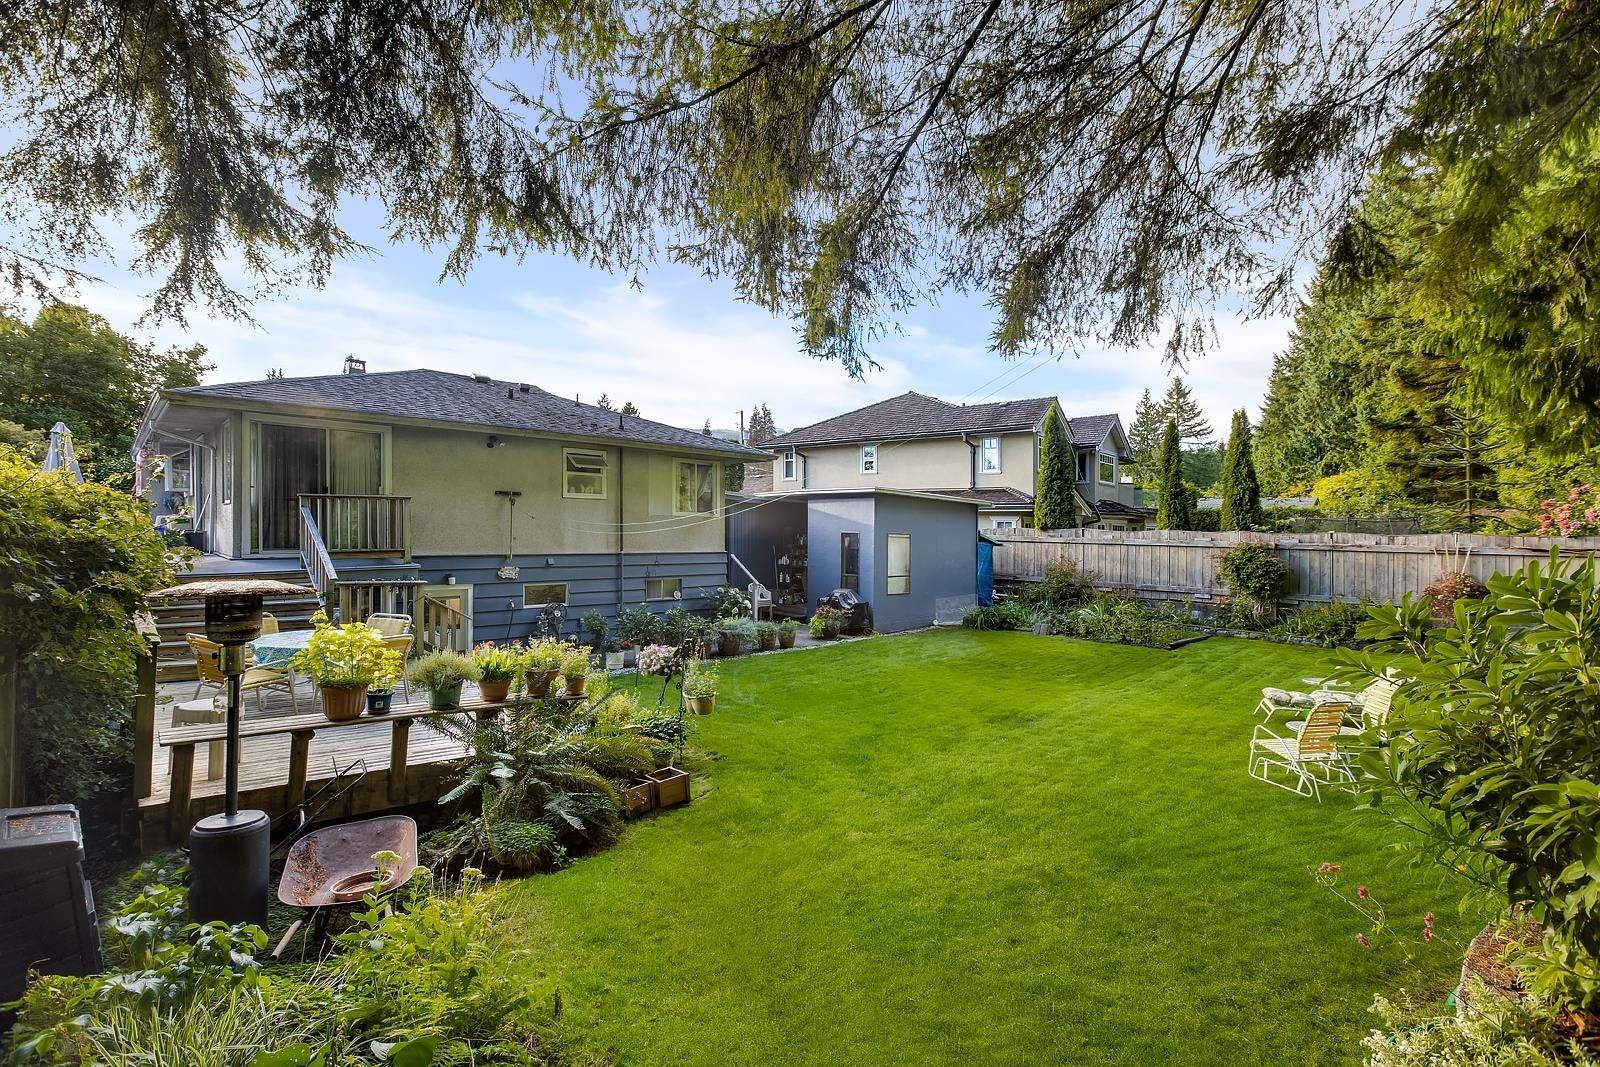 3495 WELLINGTON CRESCENT - Edgemont House/Single Family for sale, 3 Bedrooms (R2617949) - #12